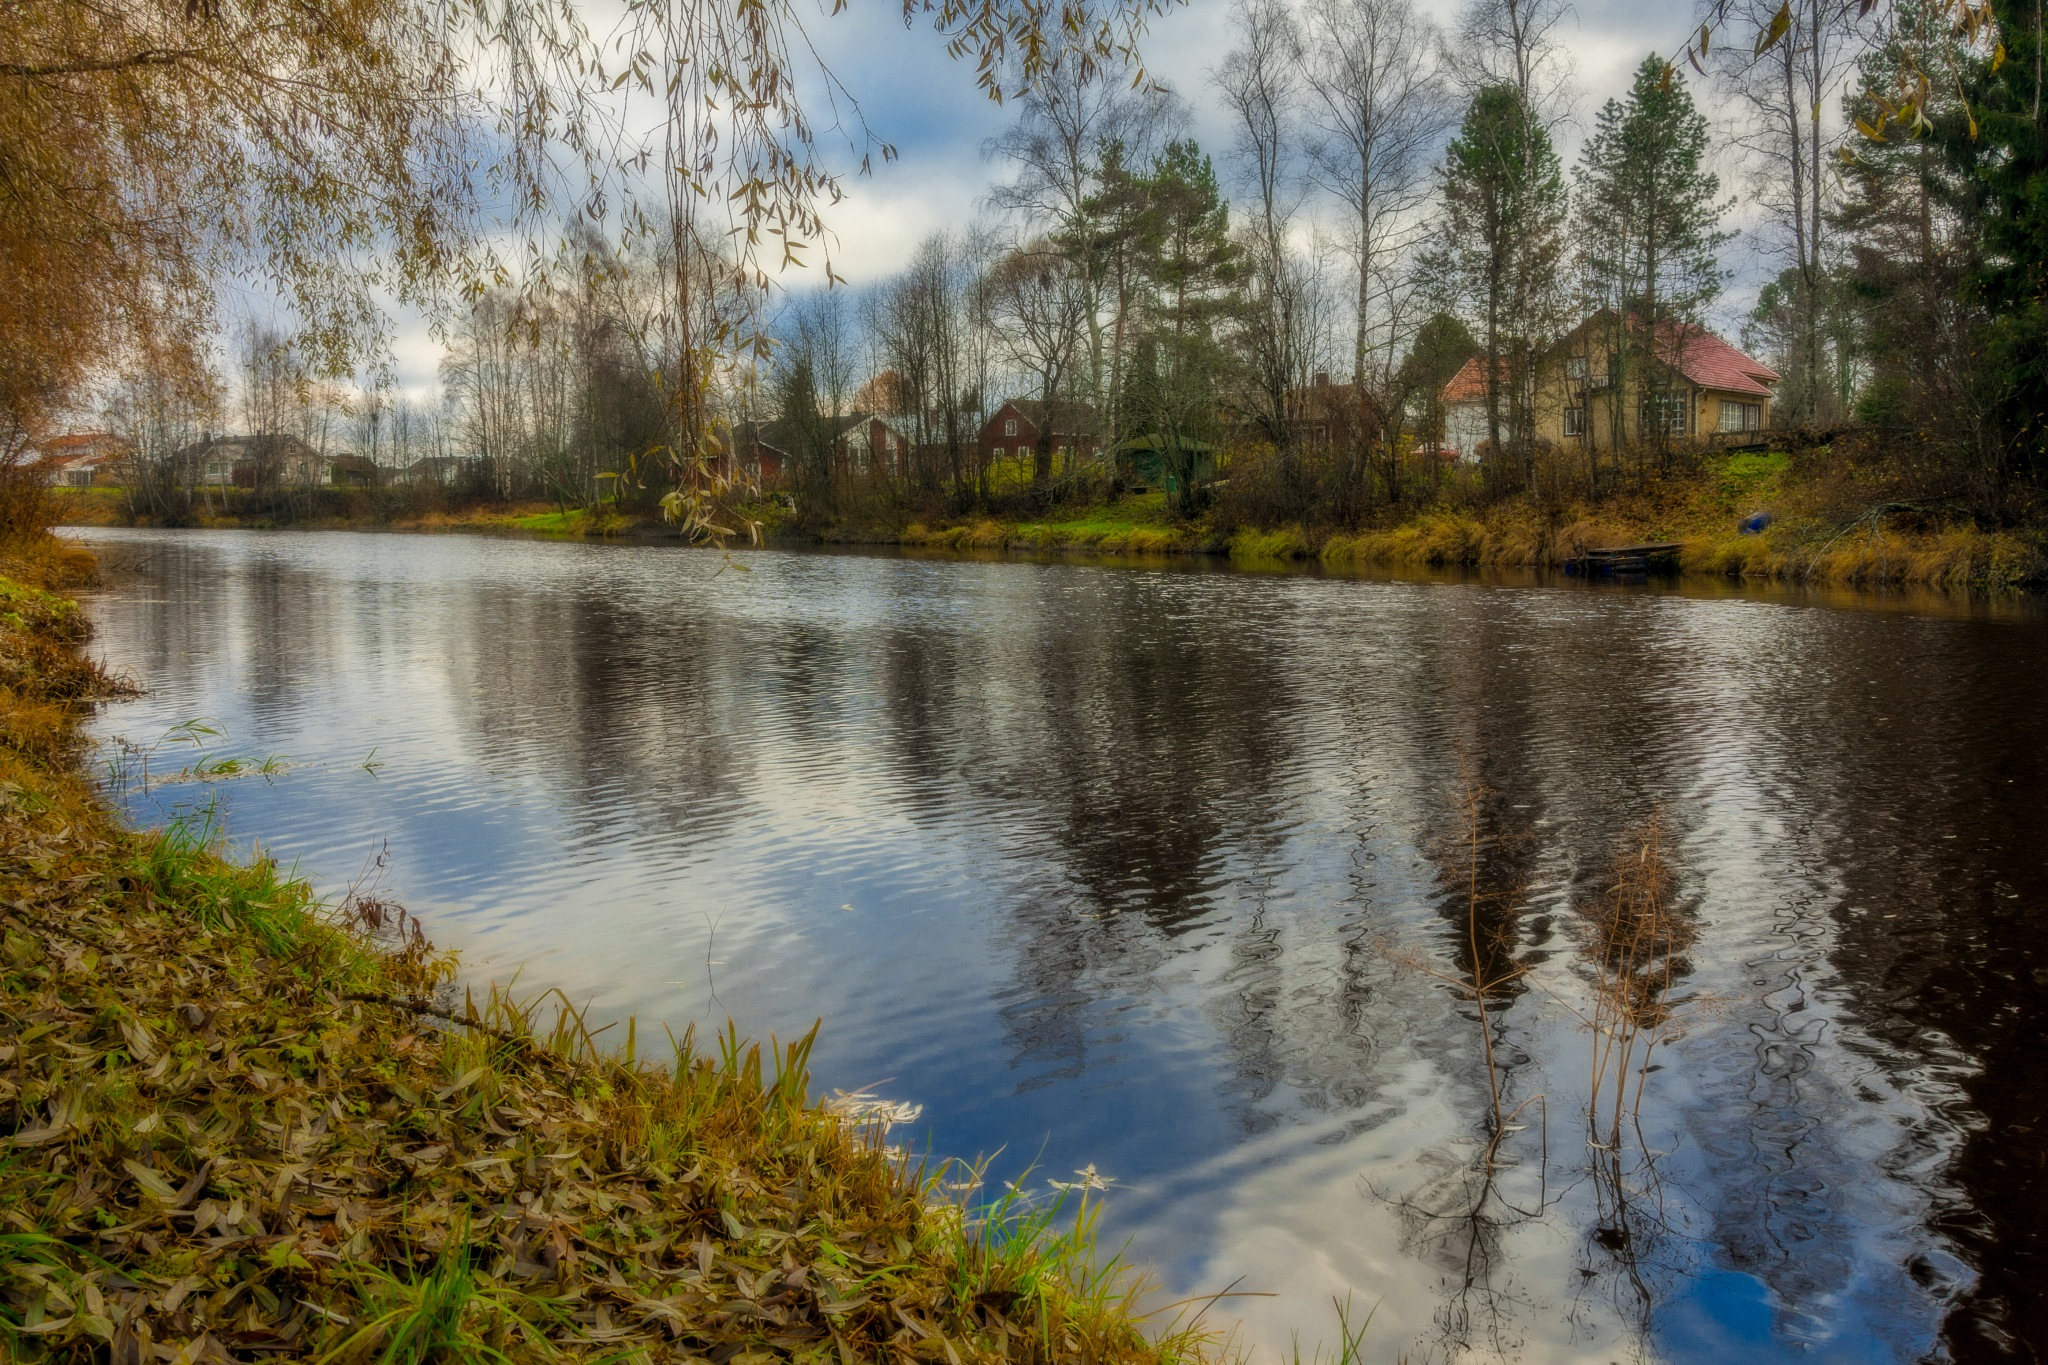 Down By The River by bojan.bilas